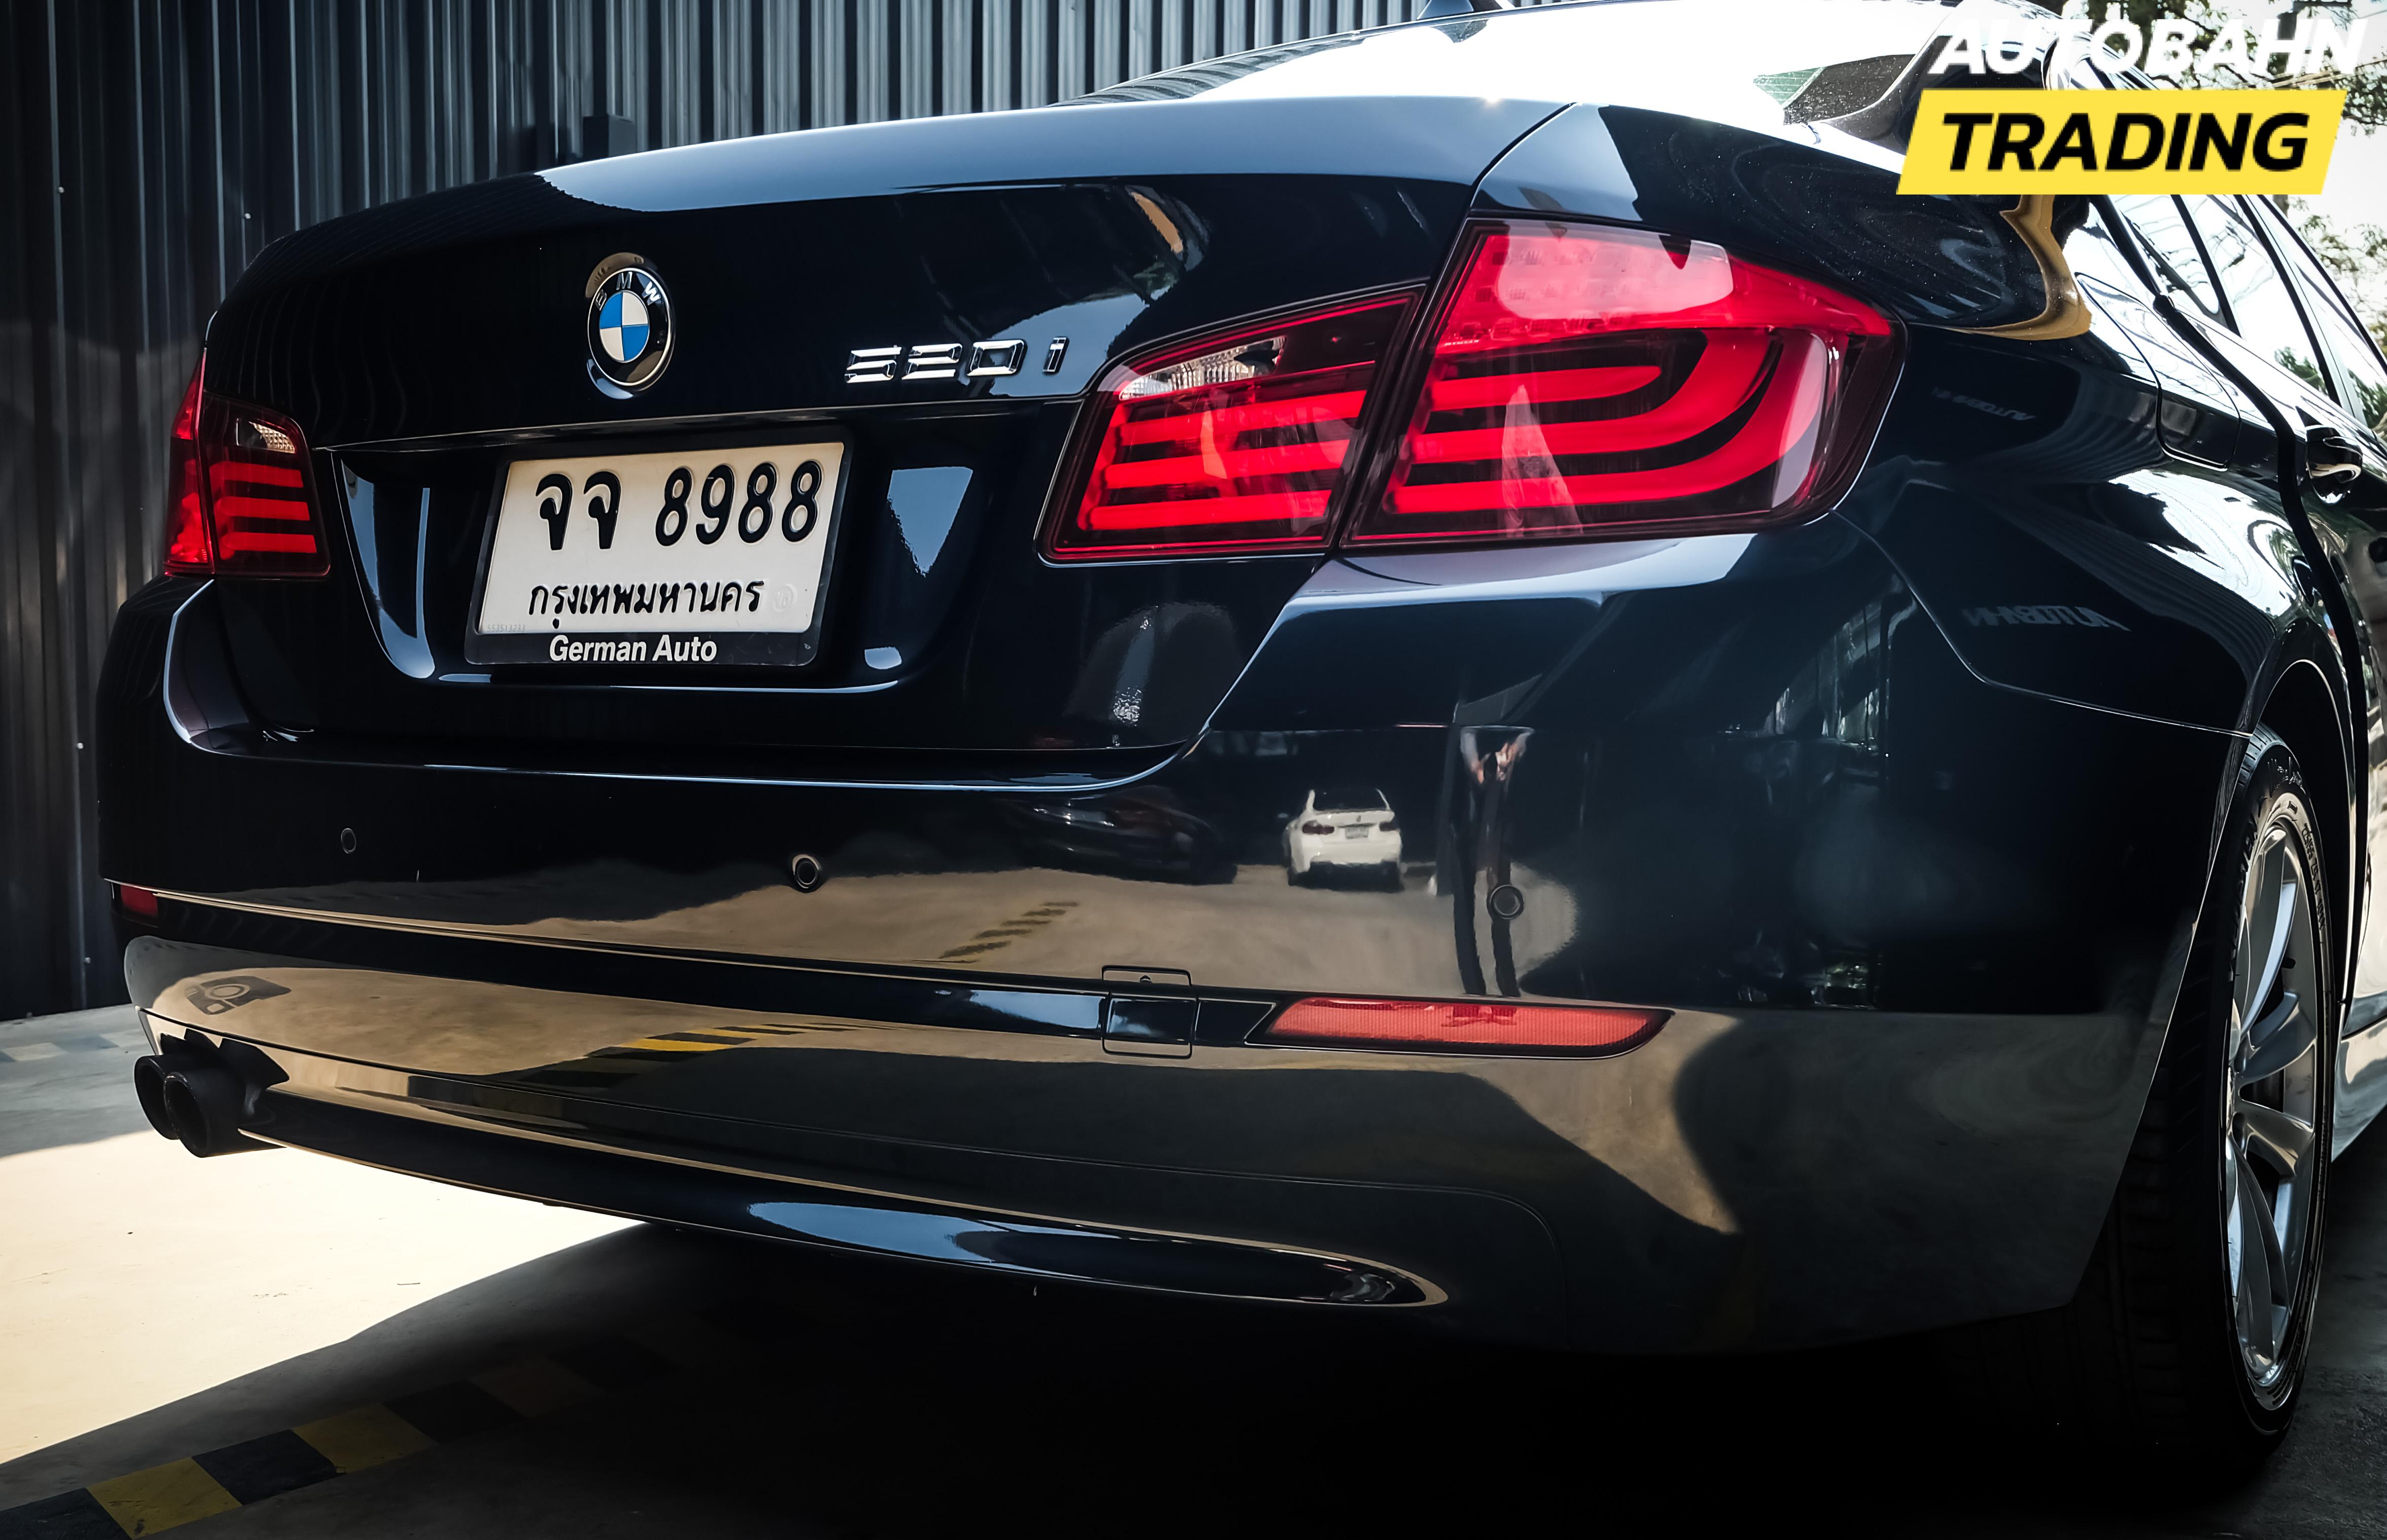 2012 BMW 520i 2.0 F10 (ปี 10-16) Sedan AT full